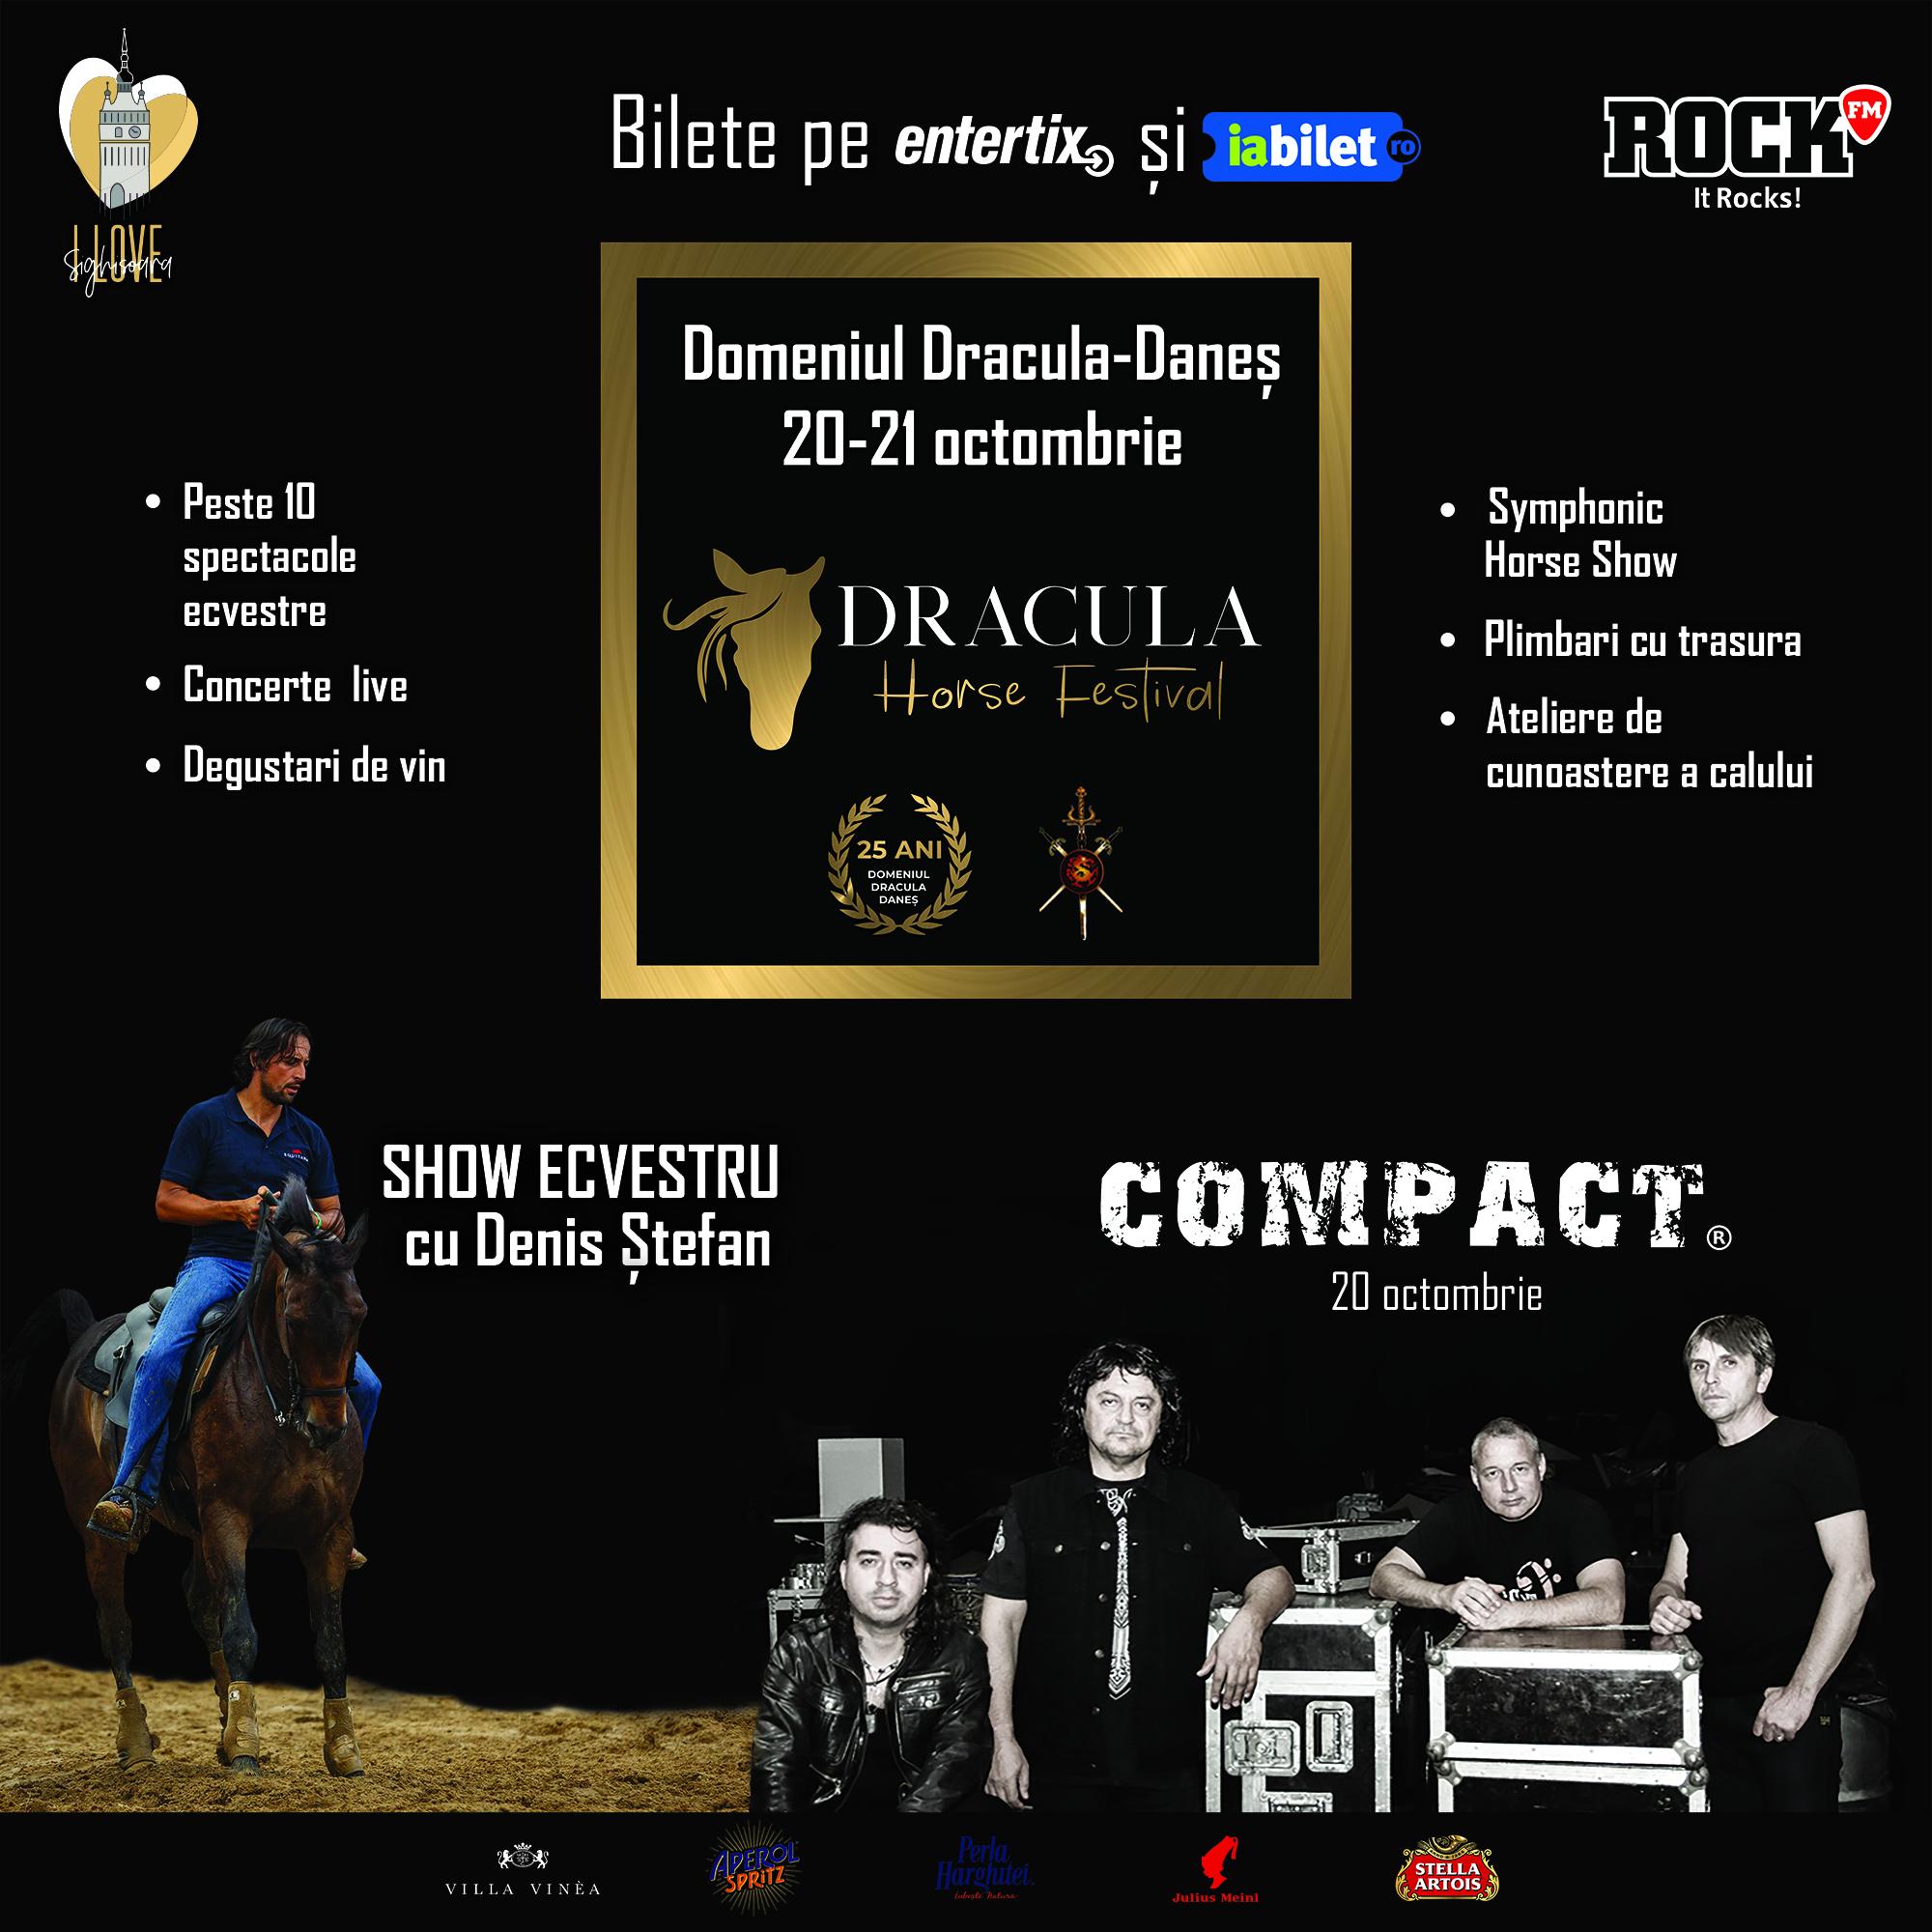 starul Dracula Horse Festival